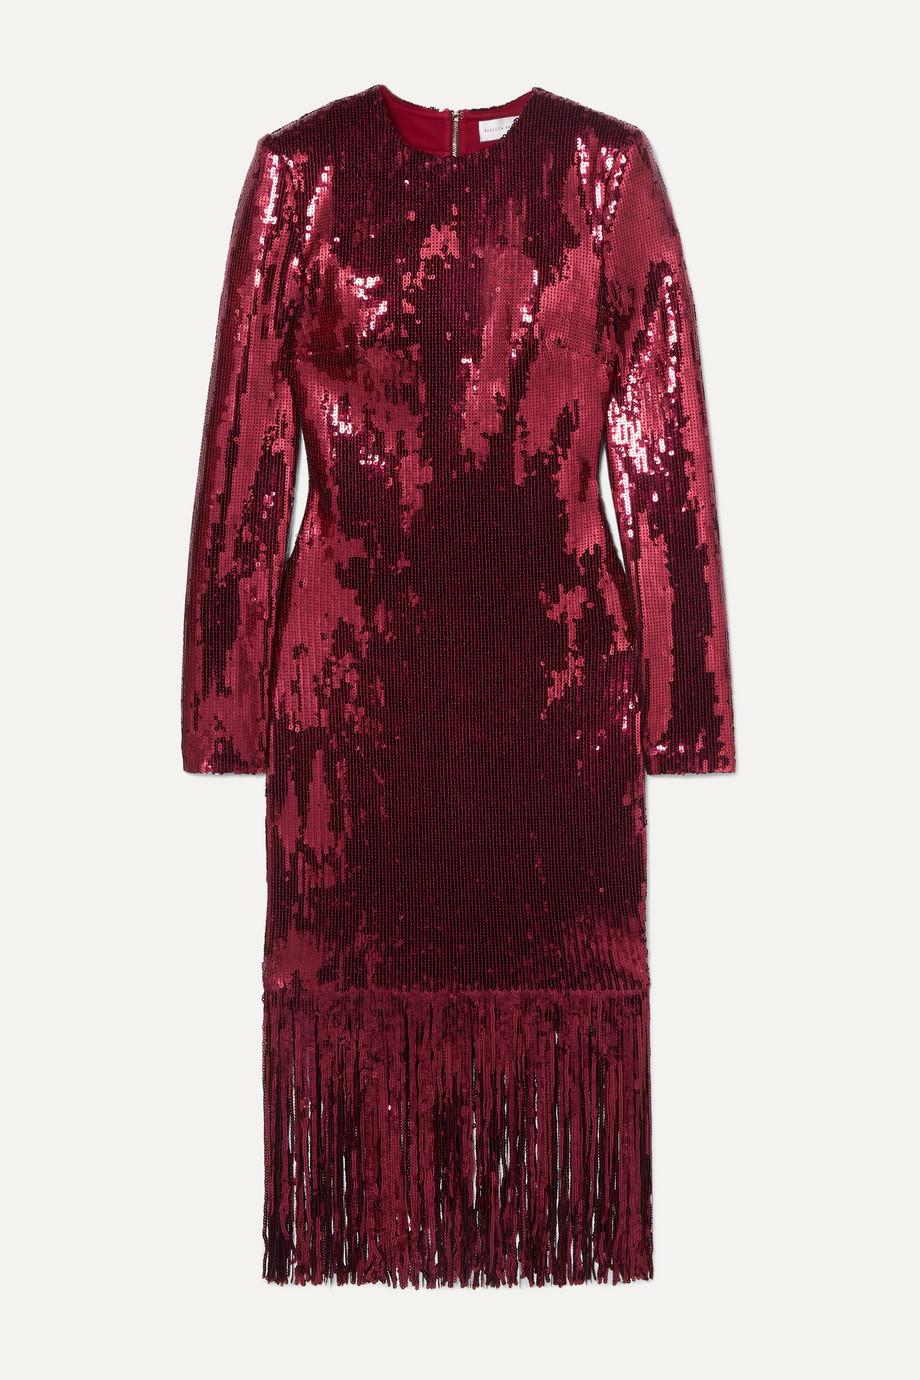 Rebecca Vallance Matisse fringed sequinned crepe midi dress